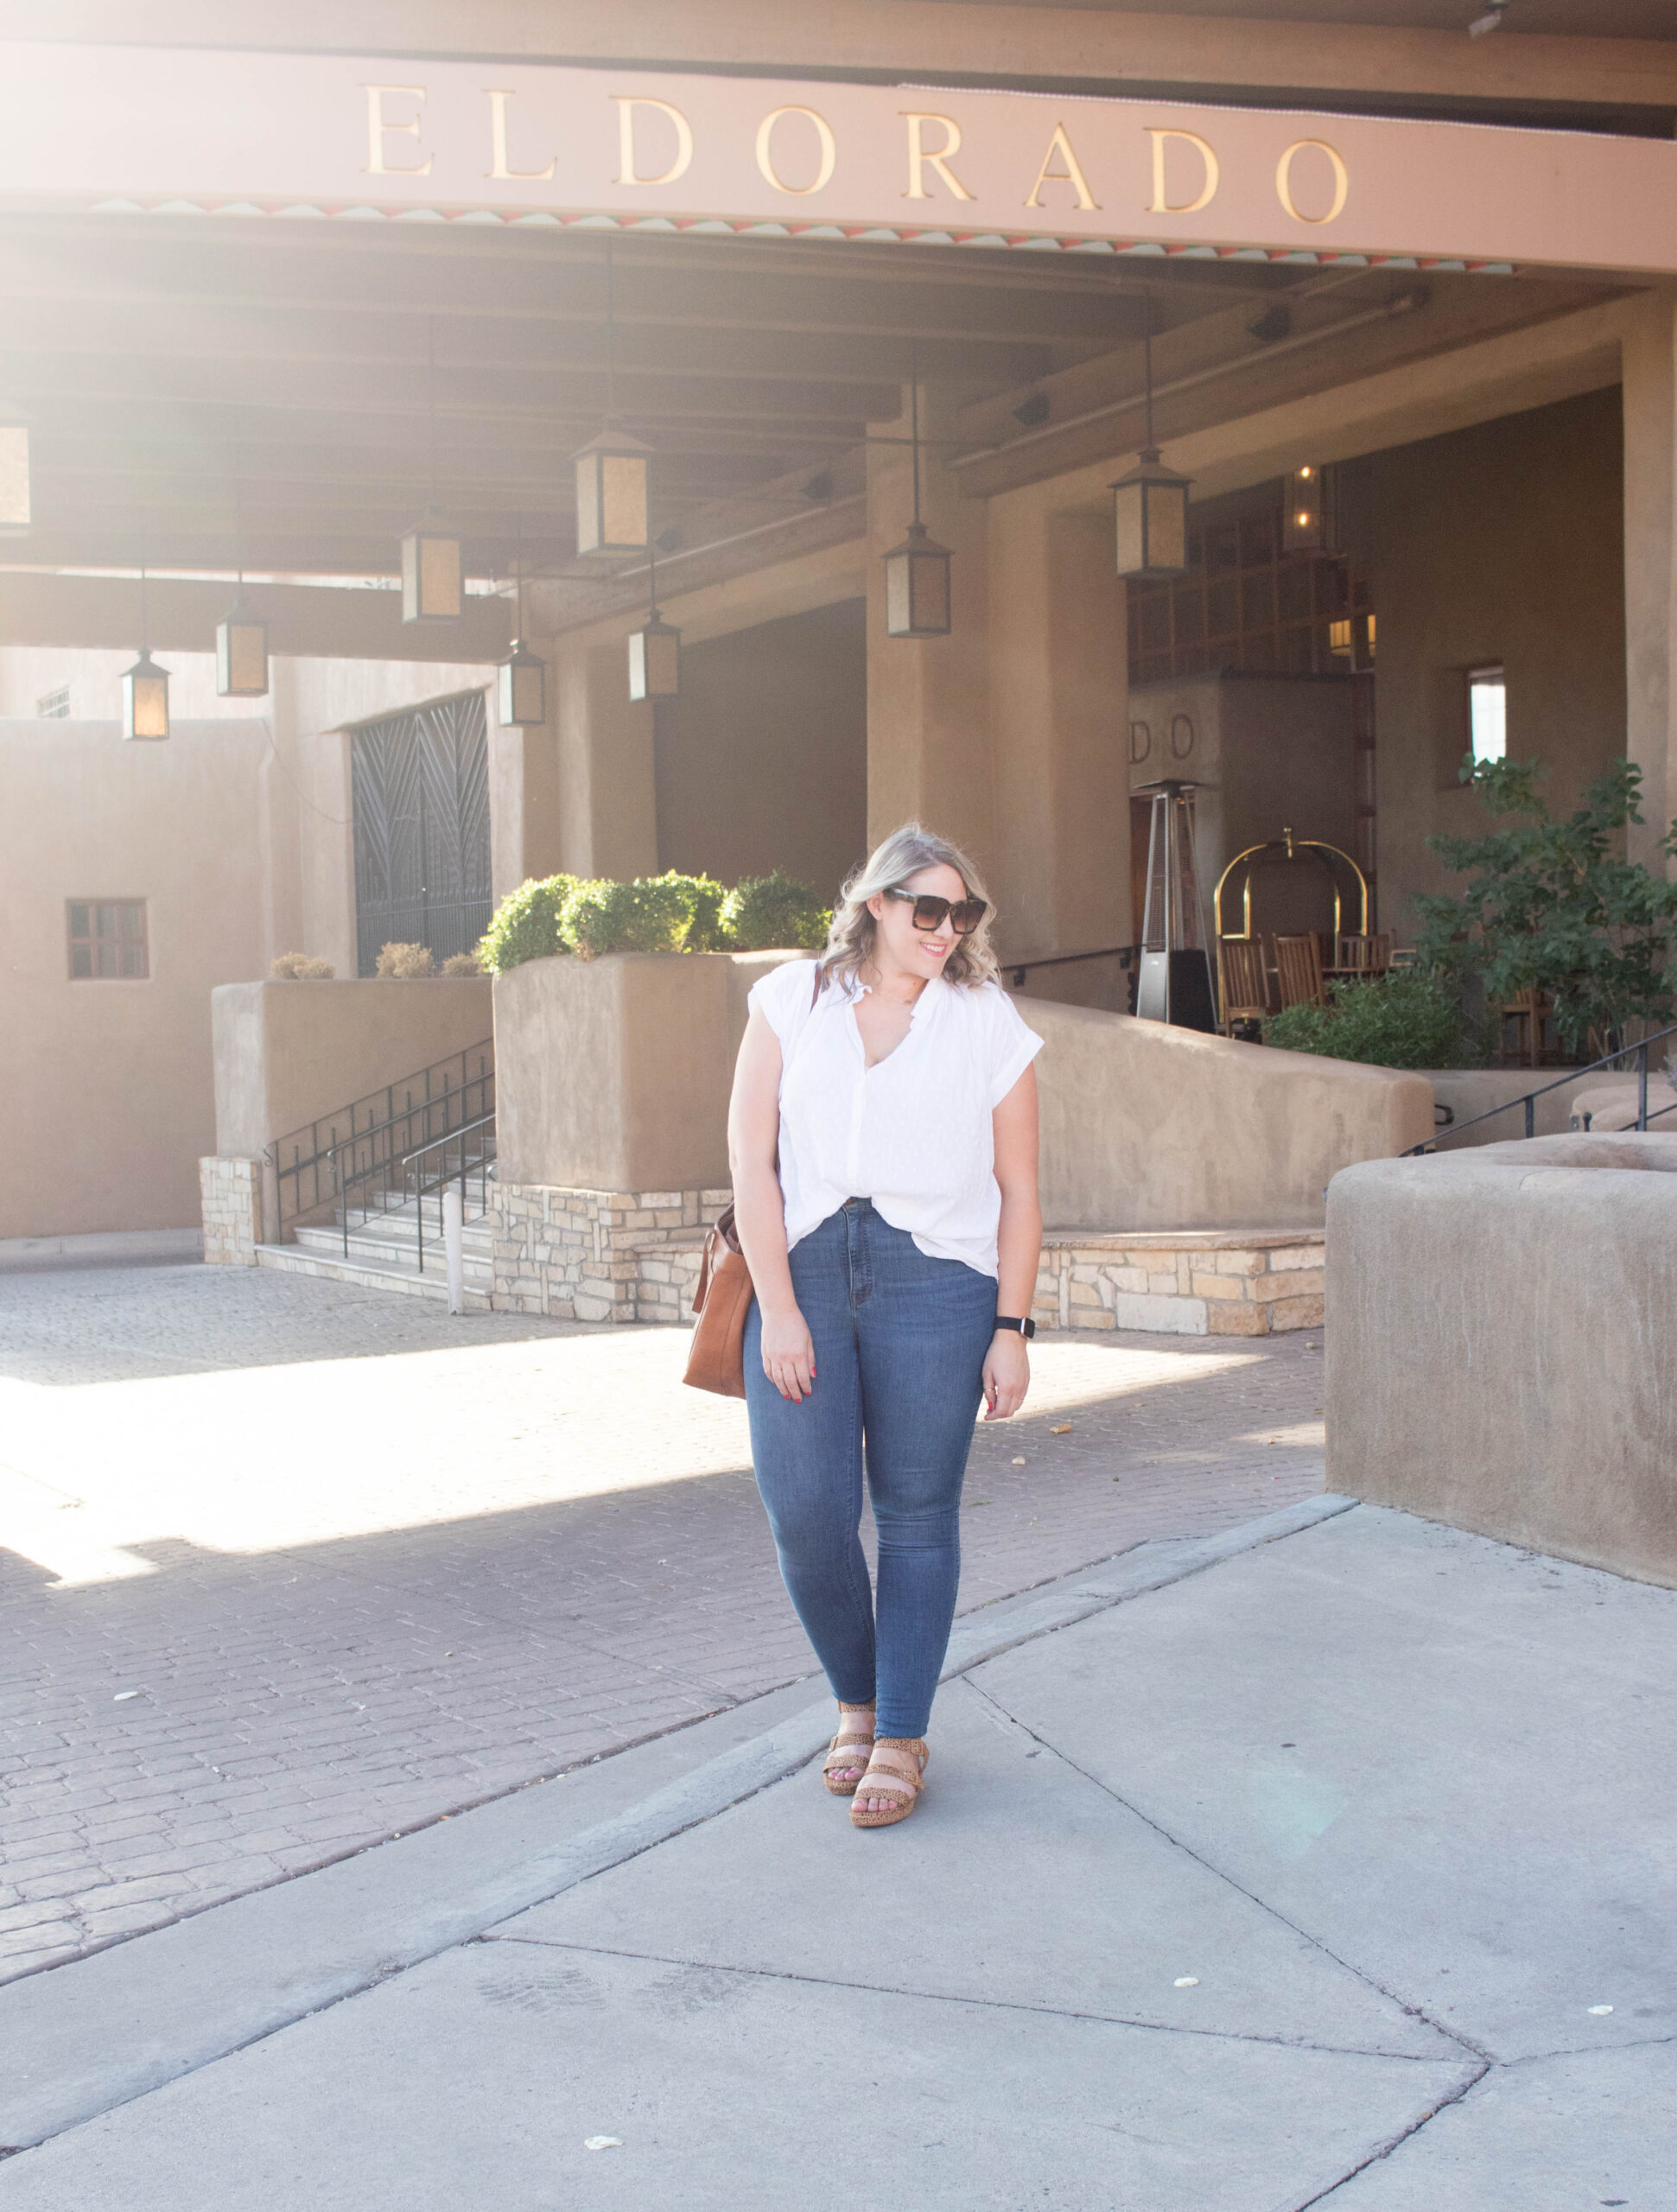 Eldorado hotel and spa santa fe #santafe #newmexico #simplysocialnmpartner